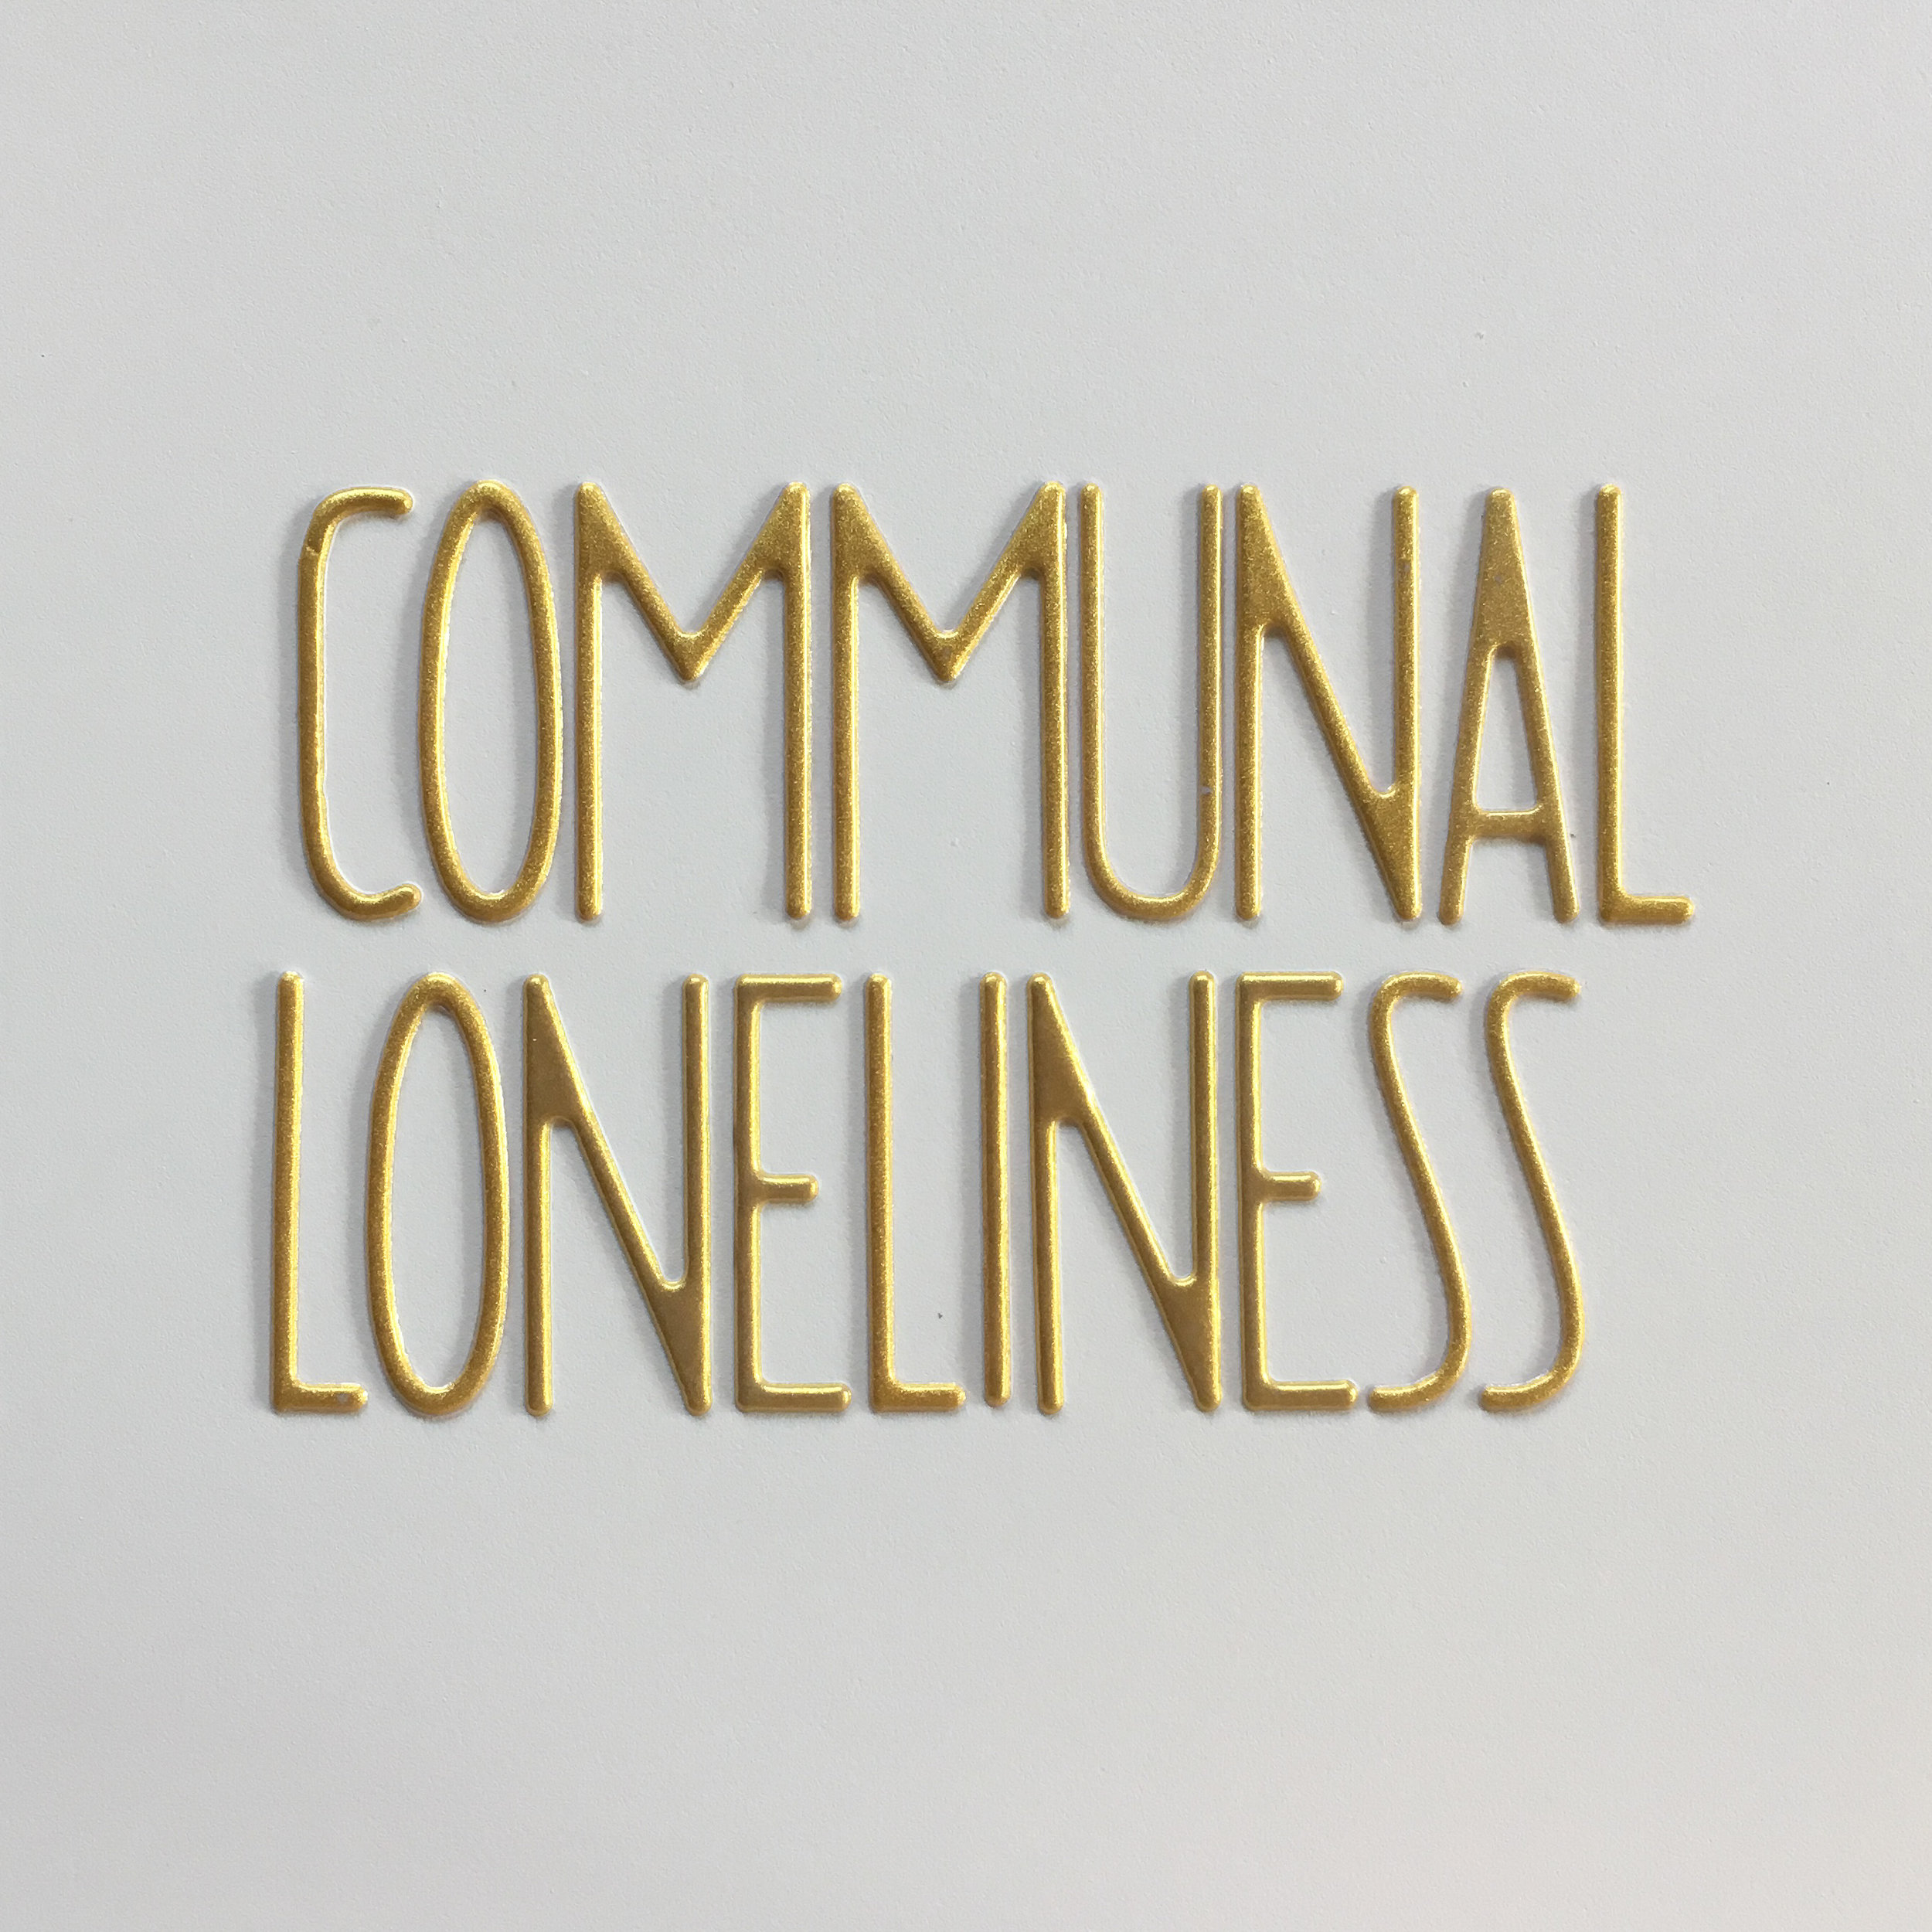 communal loneliness.jpg